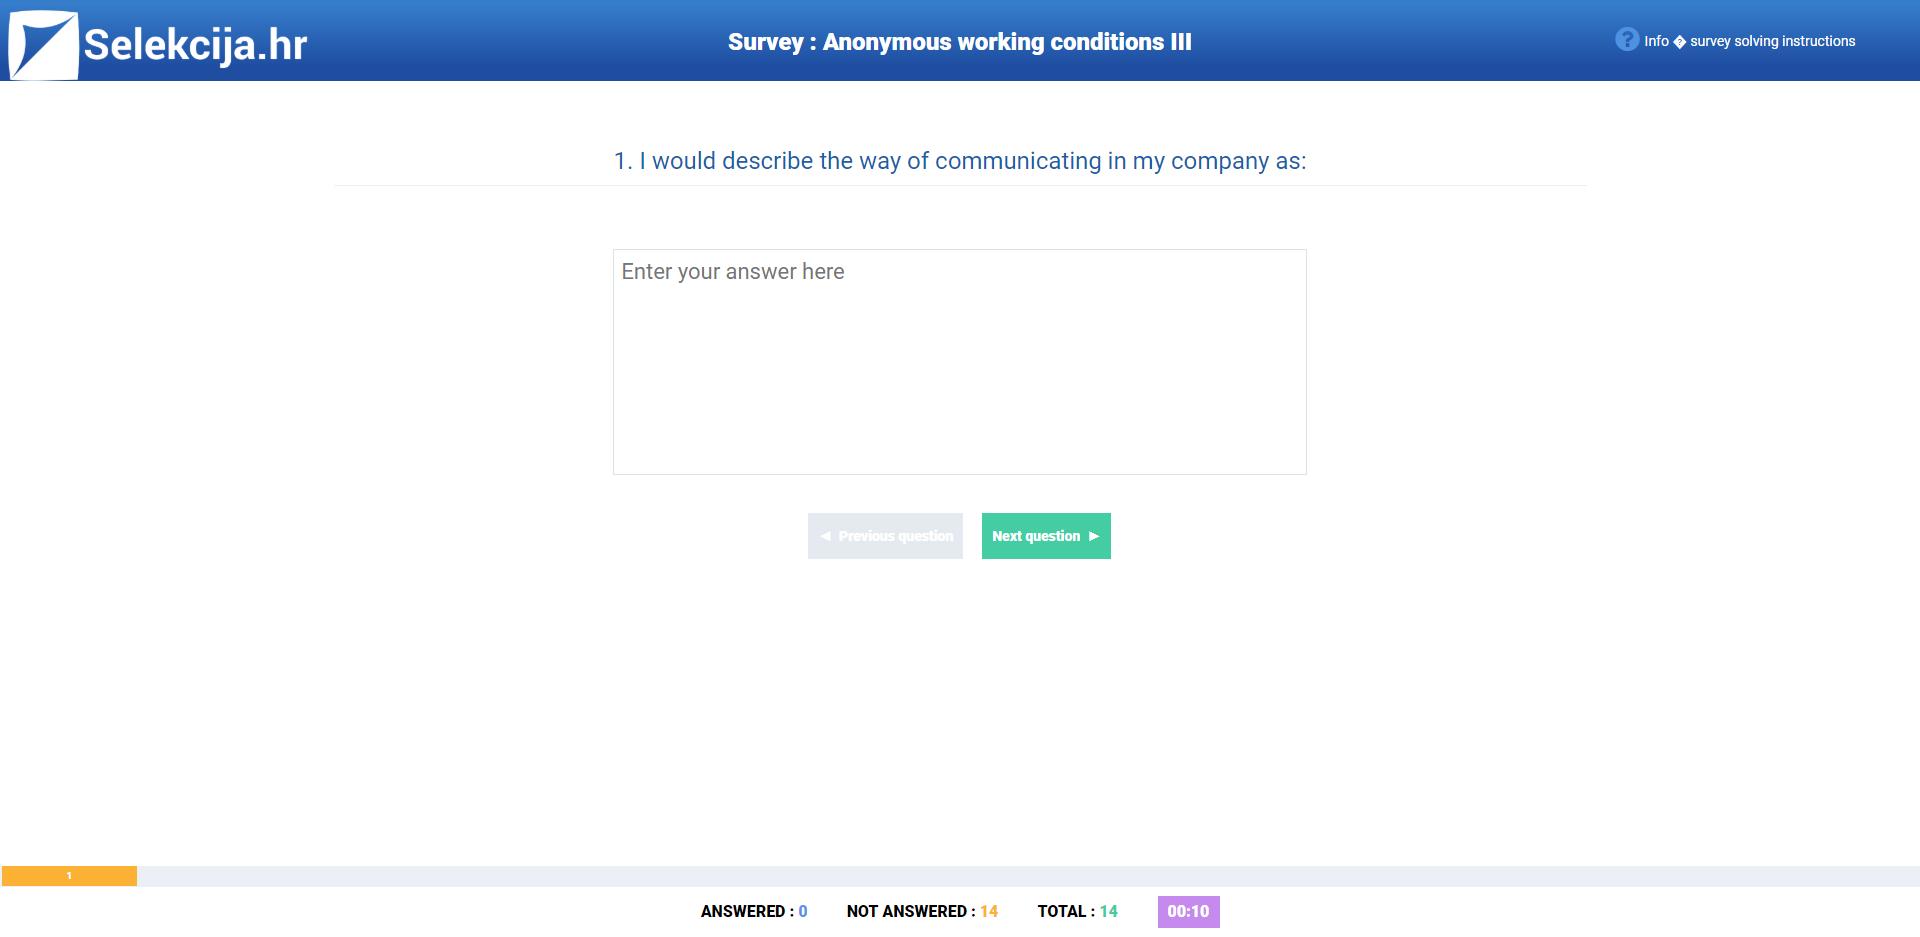 screencapture-online-selekcija-hr-assessment-edit-test-online-start-2019-04-30-11_45_40